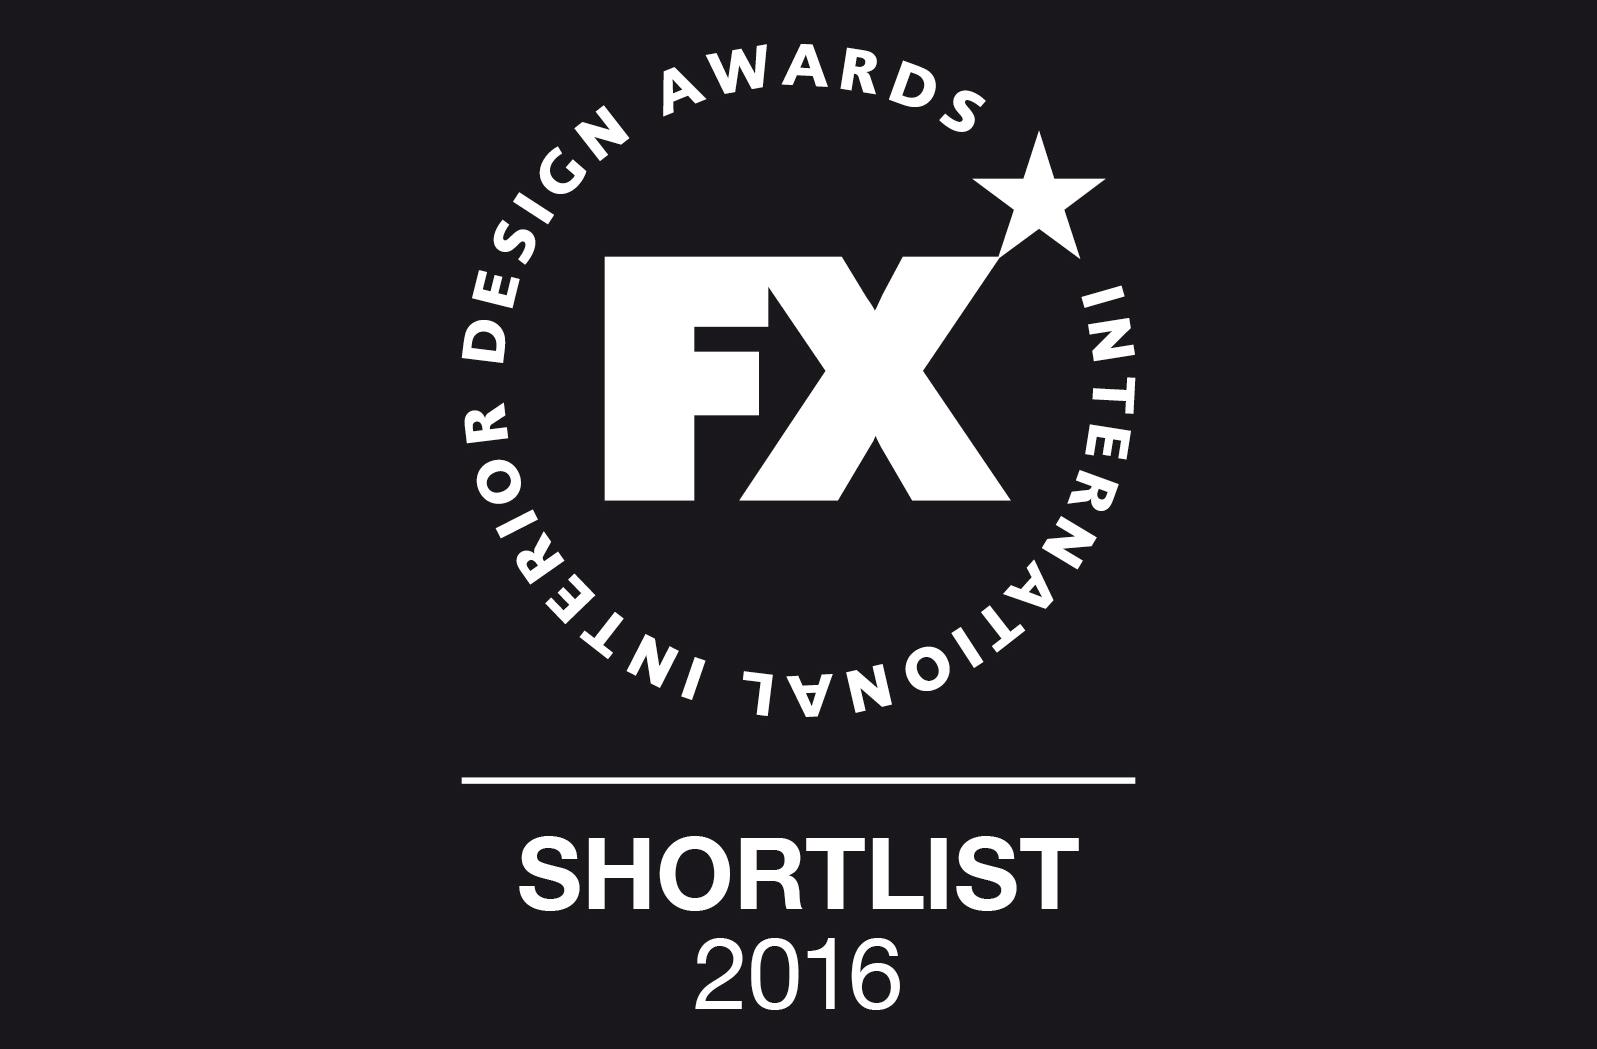 31/10/2016 - Ness Outdoor shortlisted FX Design Award 2016